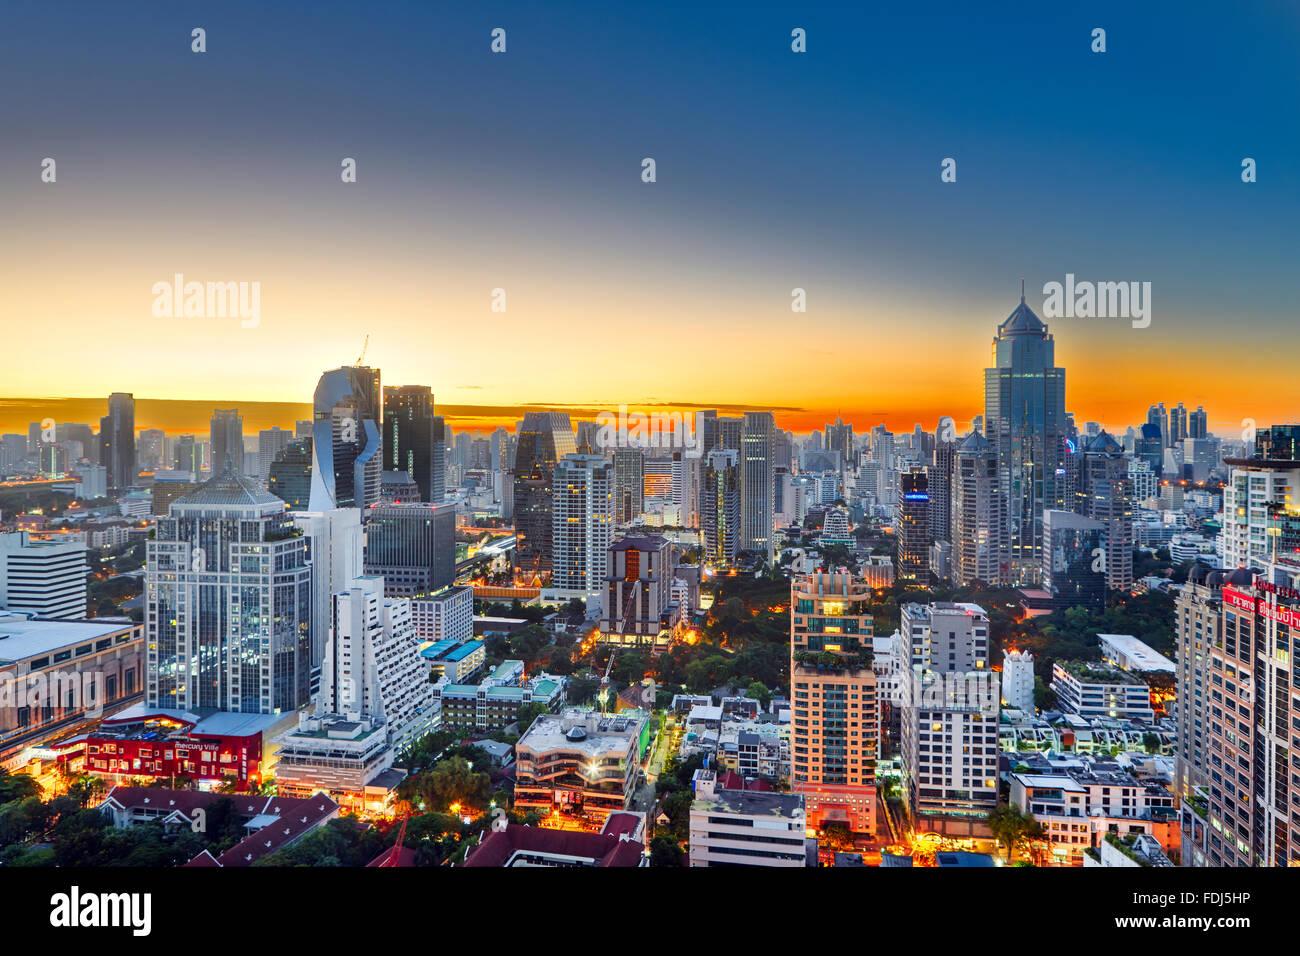 Elevated city view at sunrise. Bangkok, Thailand. Stock Photo